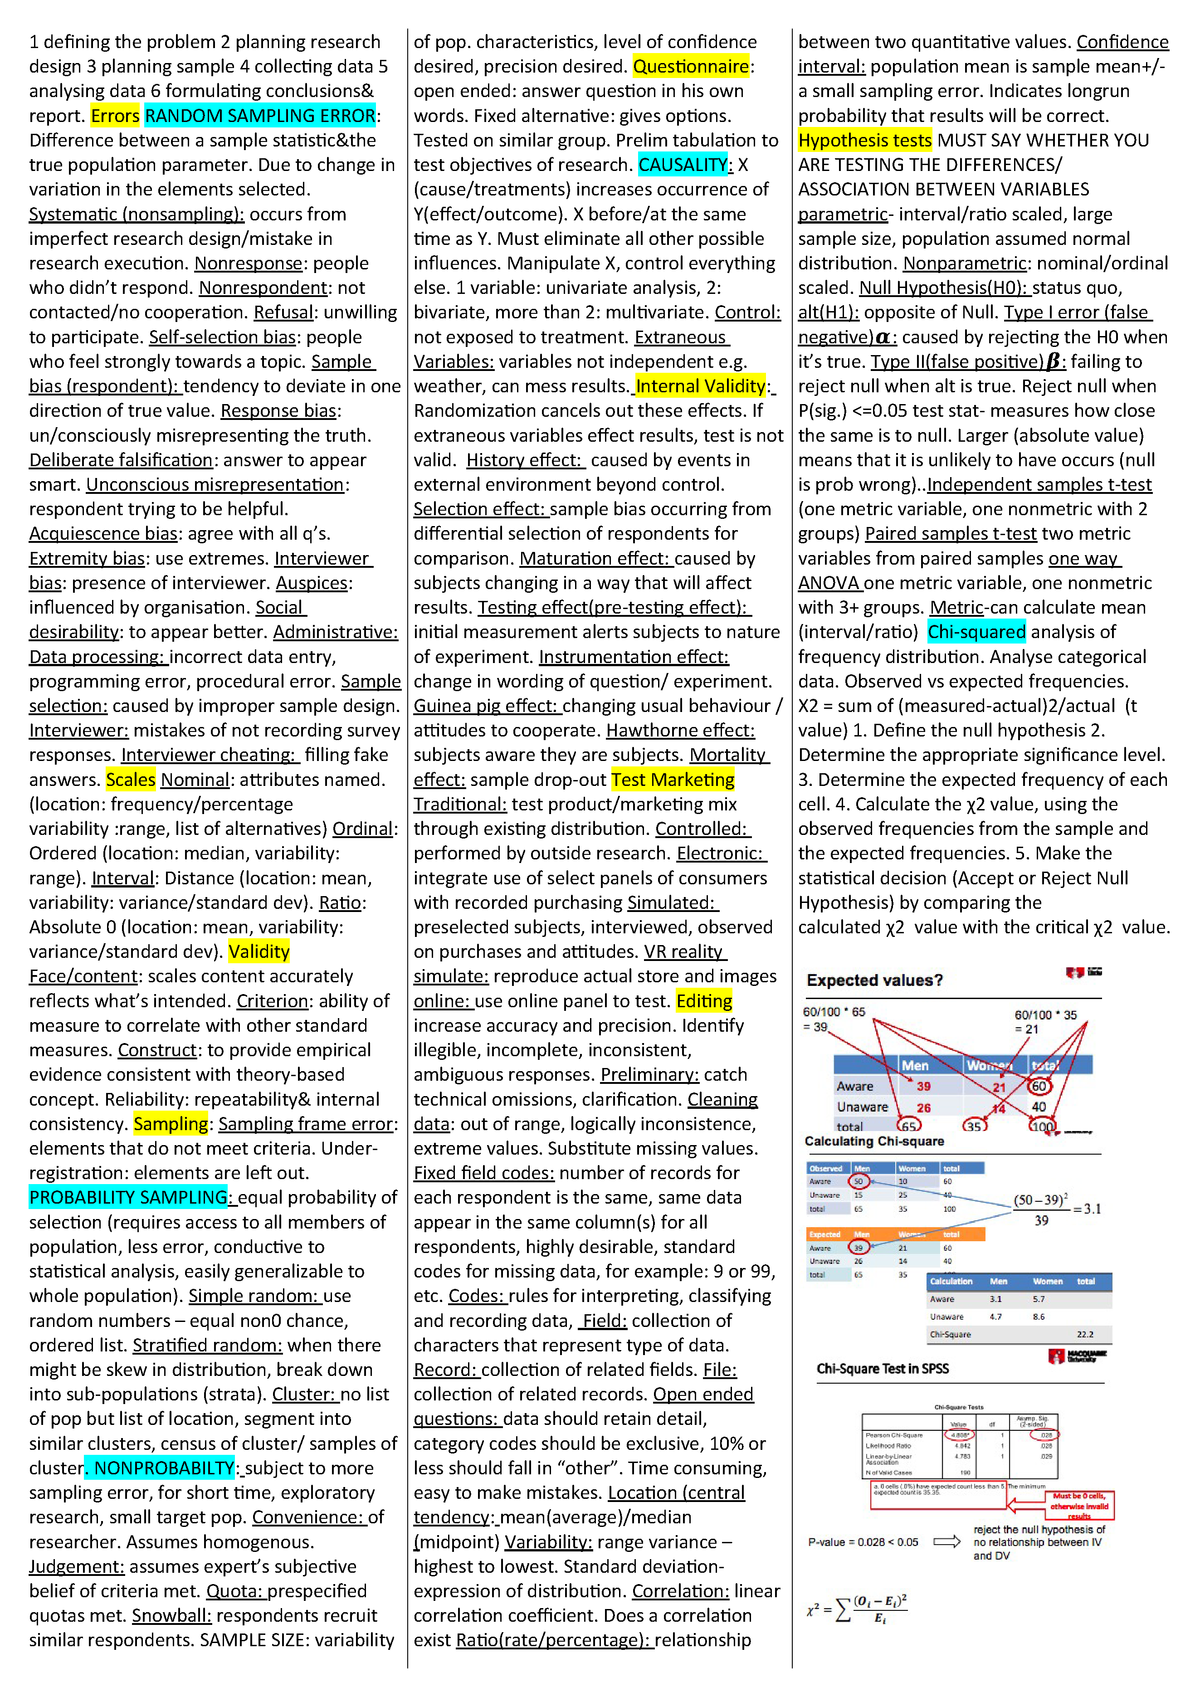 Cheat sheet 202 - MKTG202: Marketing Research - StuDocu